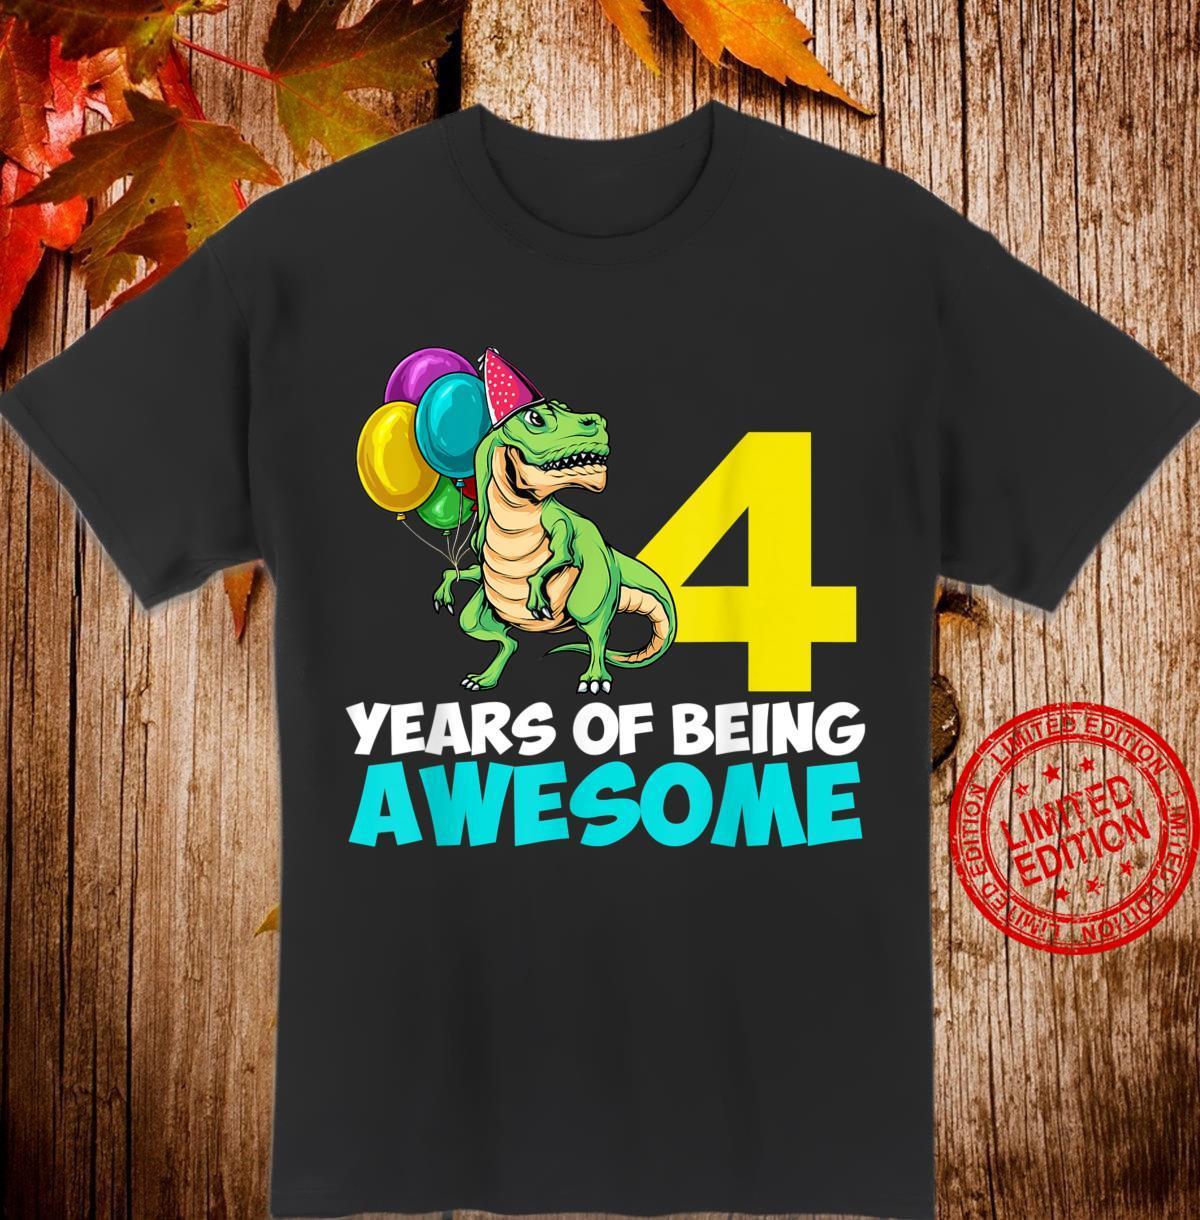 Kids 4 Year Old 4th Birthday Boy Girl T Rex Dinosaur Shirt